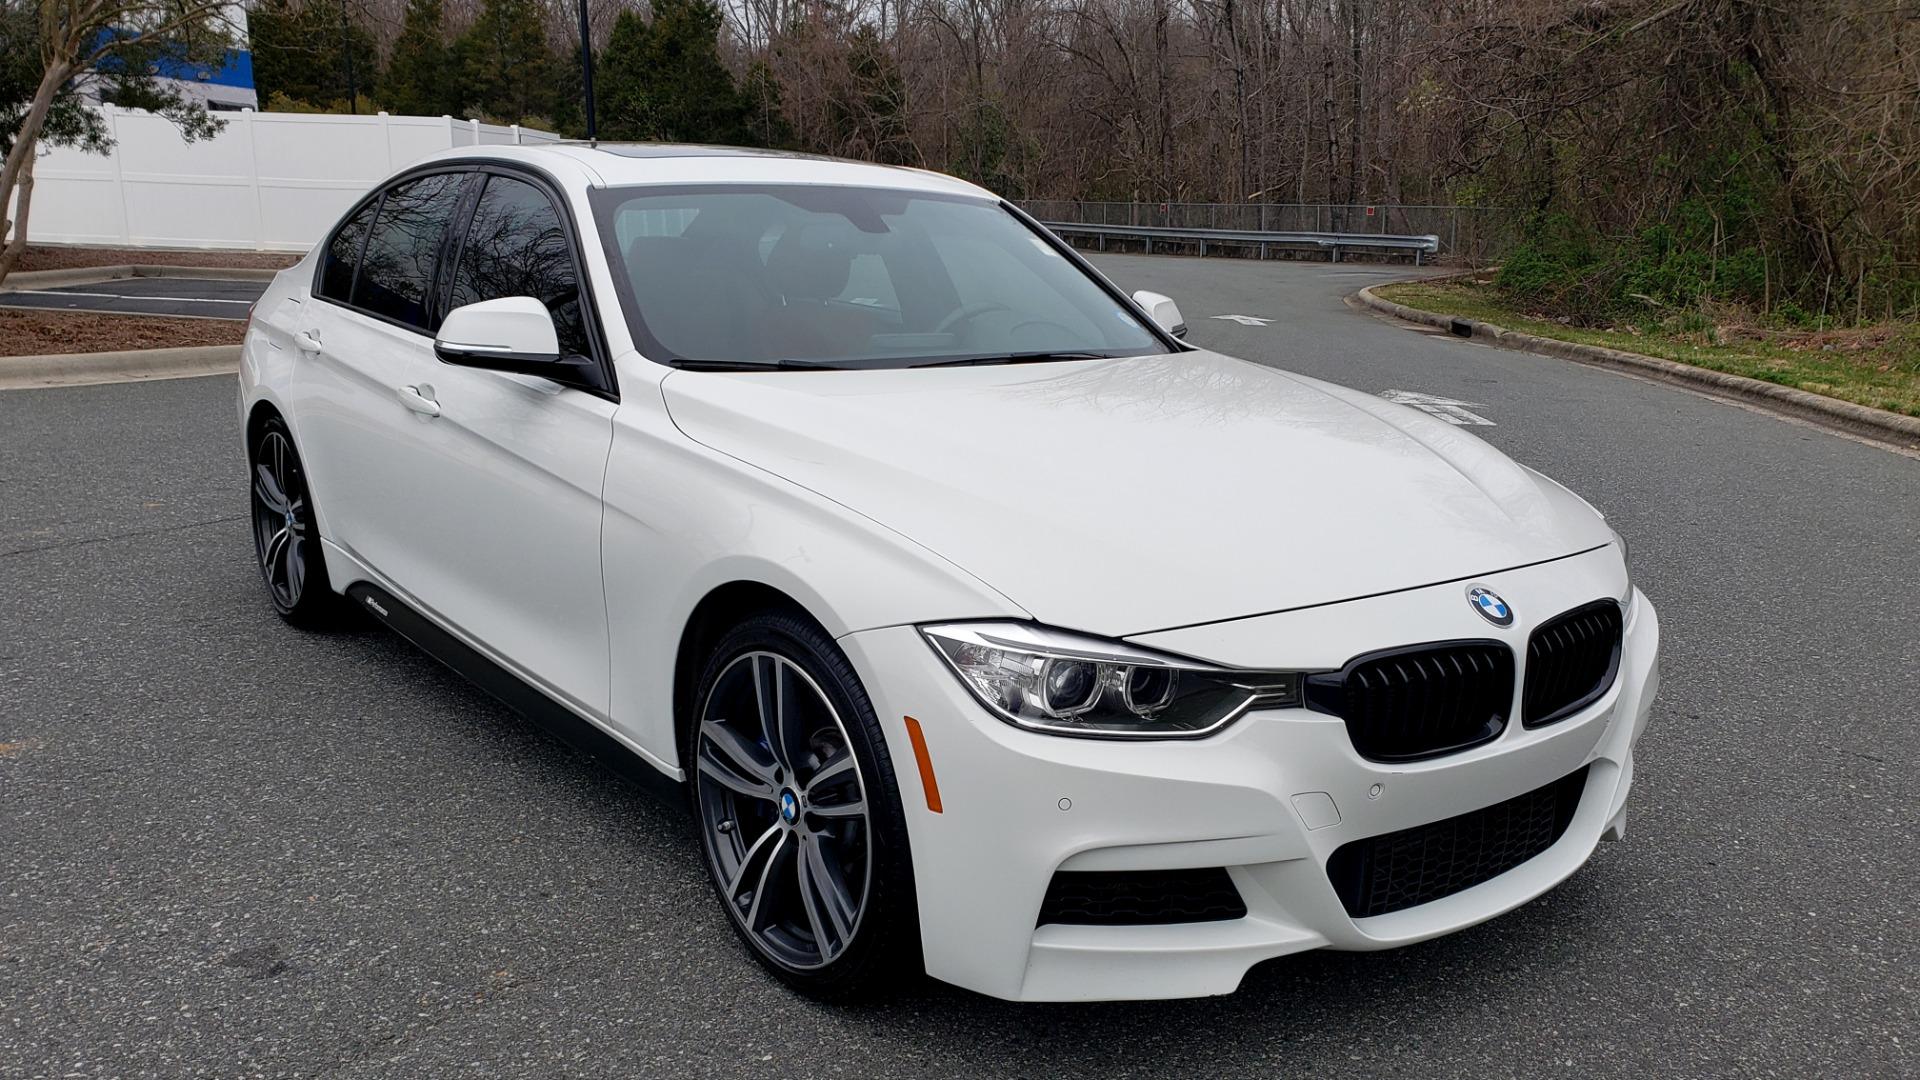 Used 2015 BMW 3 Series 335I M-SPORT / PREM PKG / HK SND / SUNROOF / REARVIEW for sale Sold at Formula Imports in Charlotte NC 28227 4